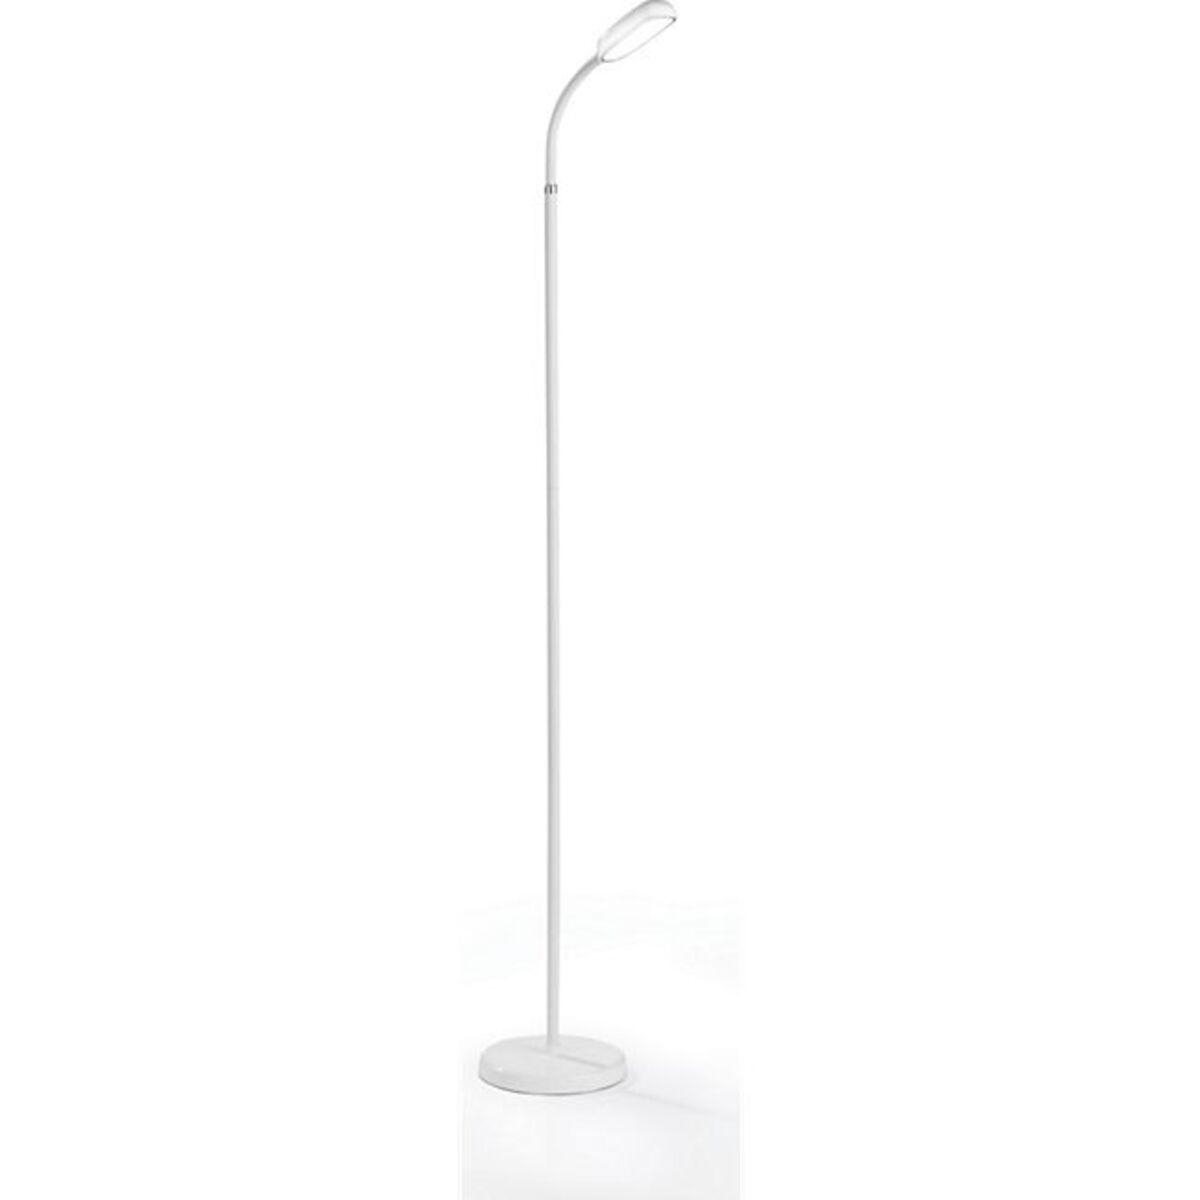 Bild 1 von EASYmaxx LED-Standleuchte Daylight 5V weiß Micro-USB 5000mAh